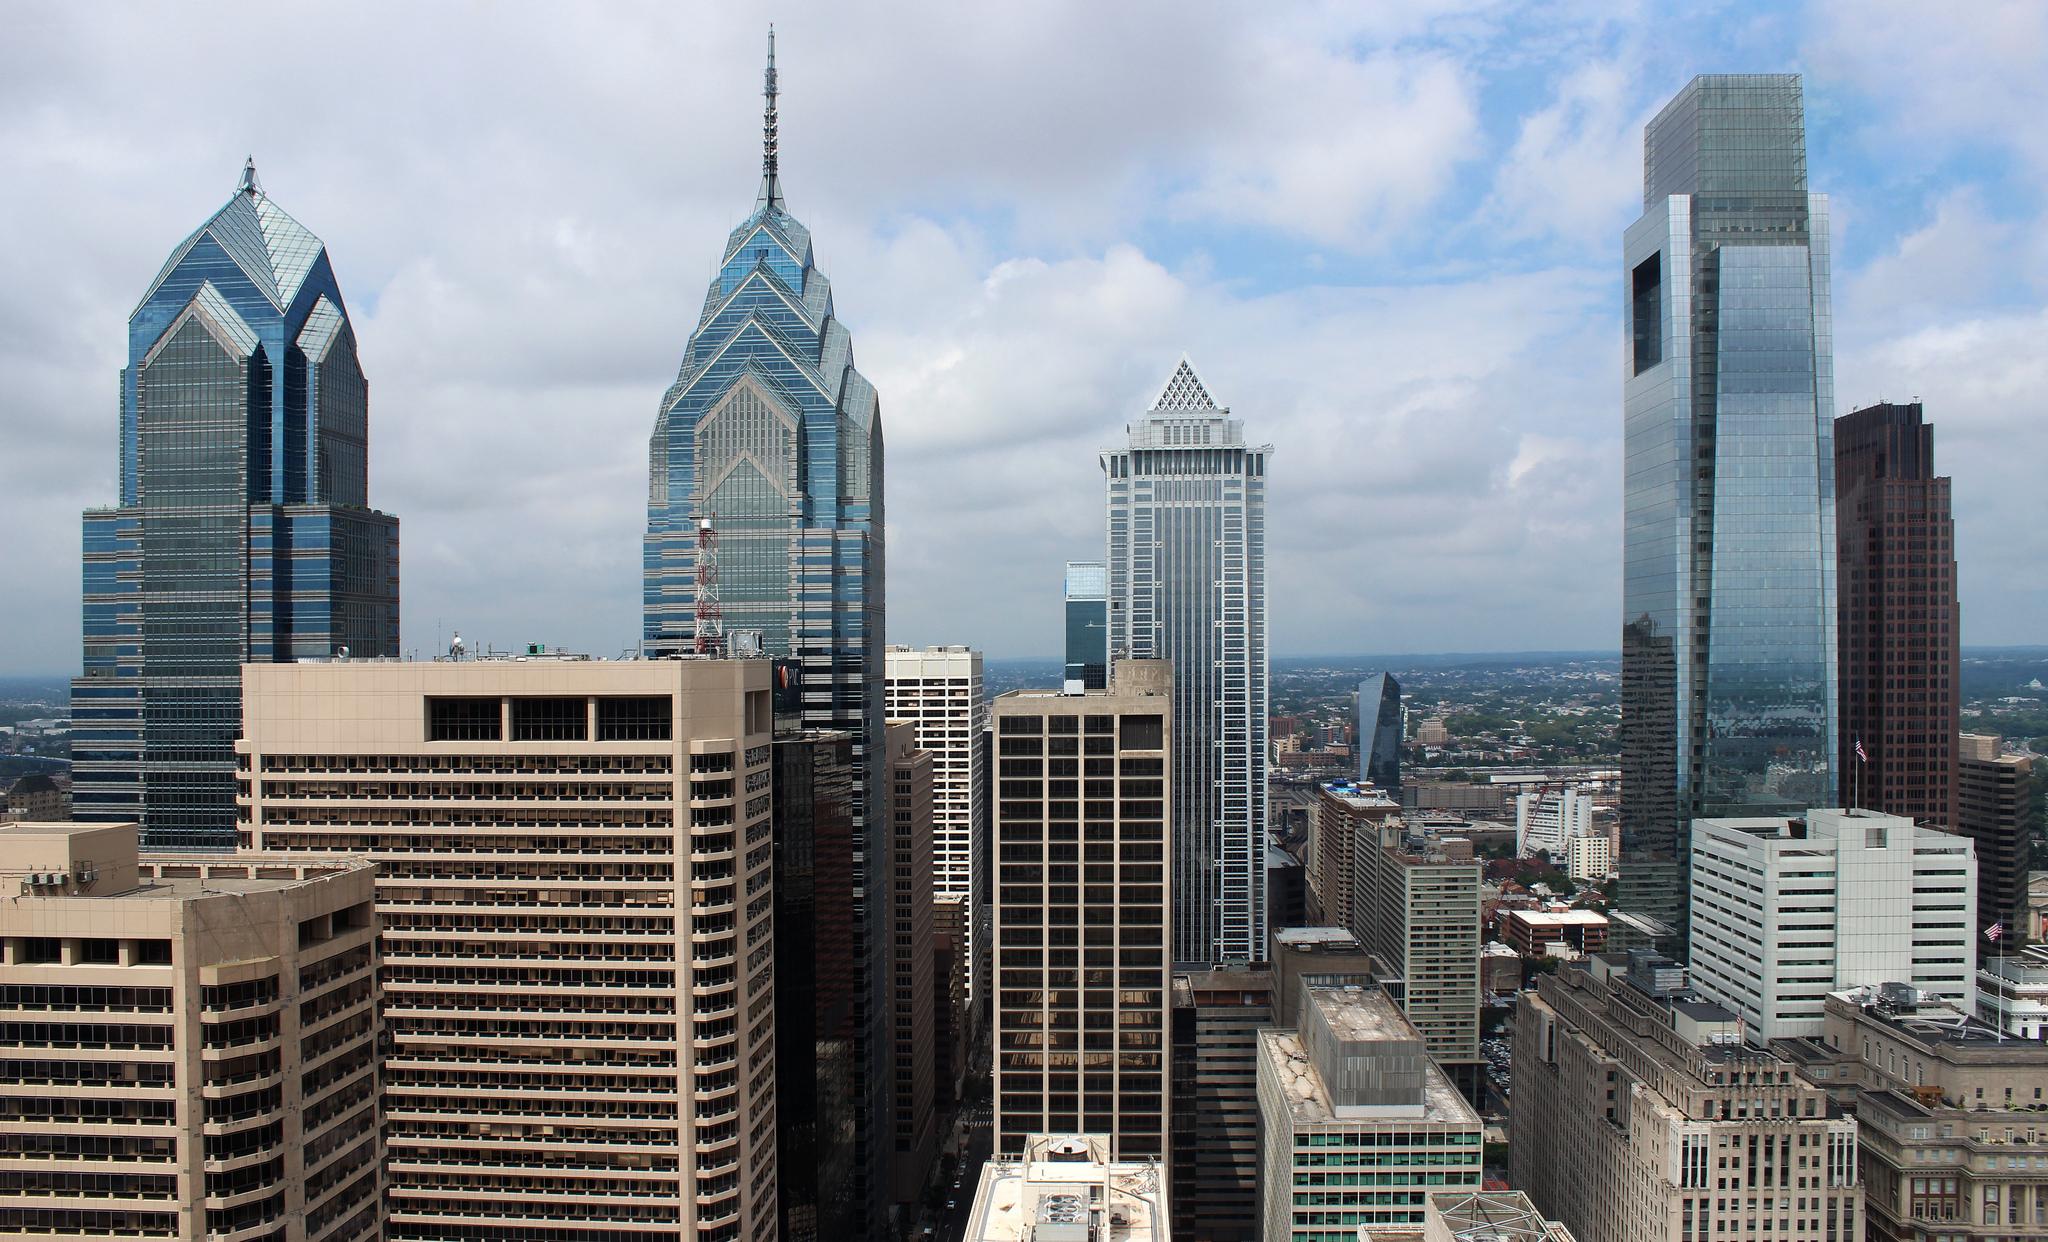 Philadelpdia Skyline by Dominic Lacivita